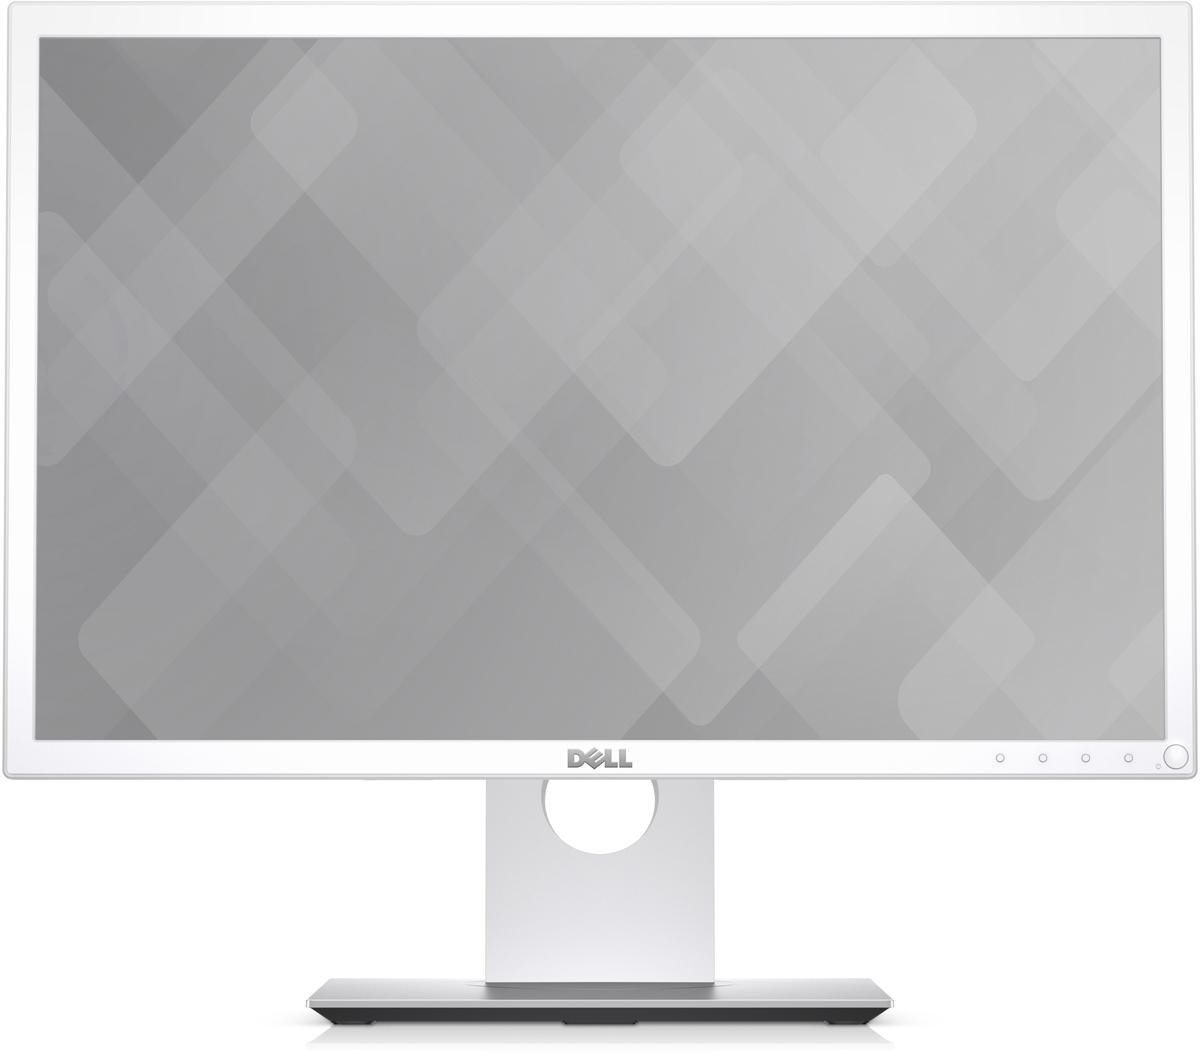 Dell P2217wh, White монитор - Мониторы